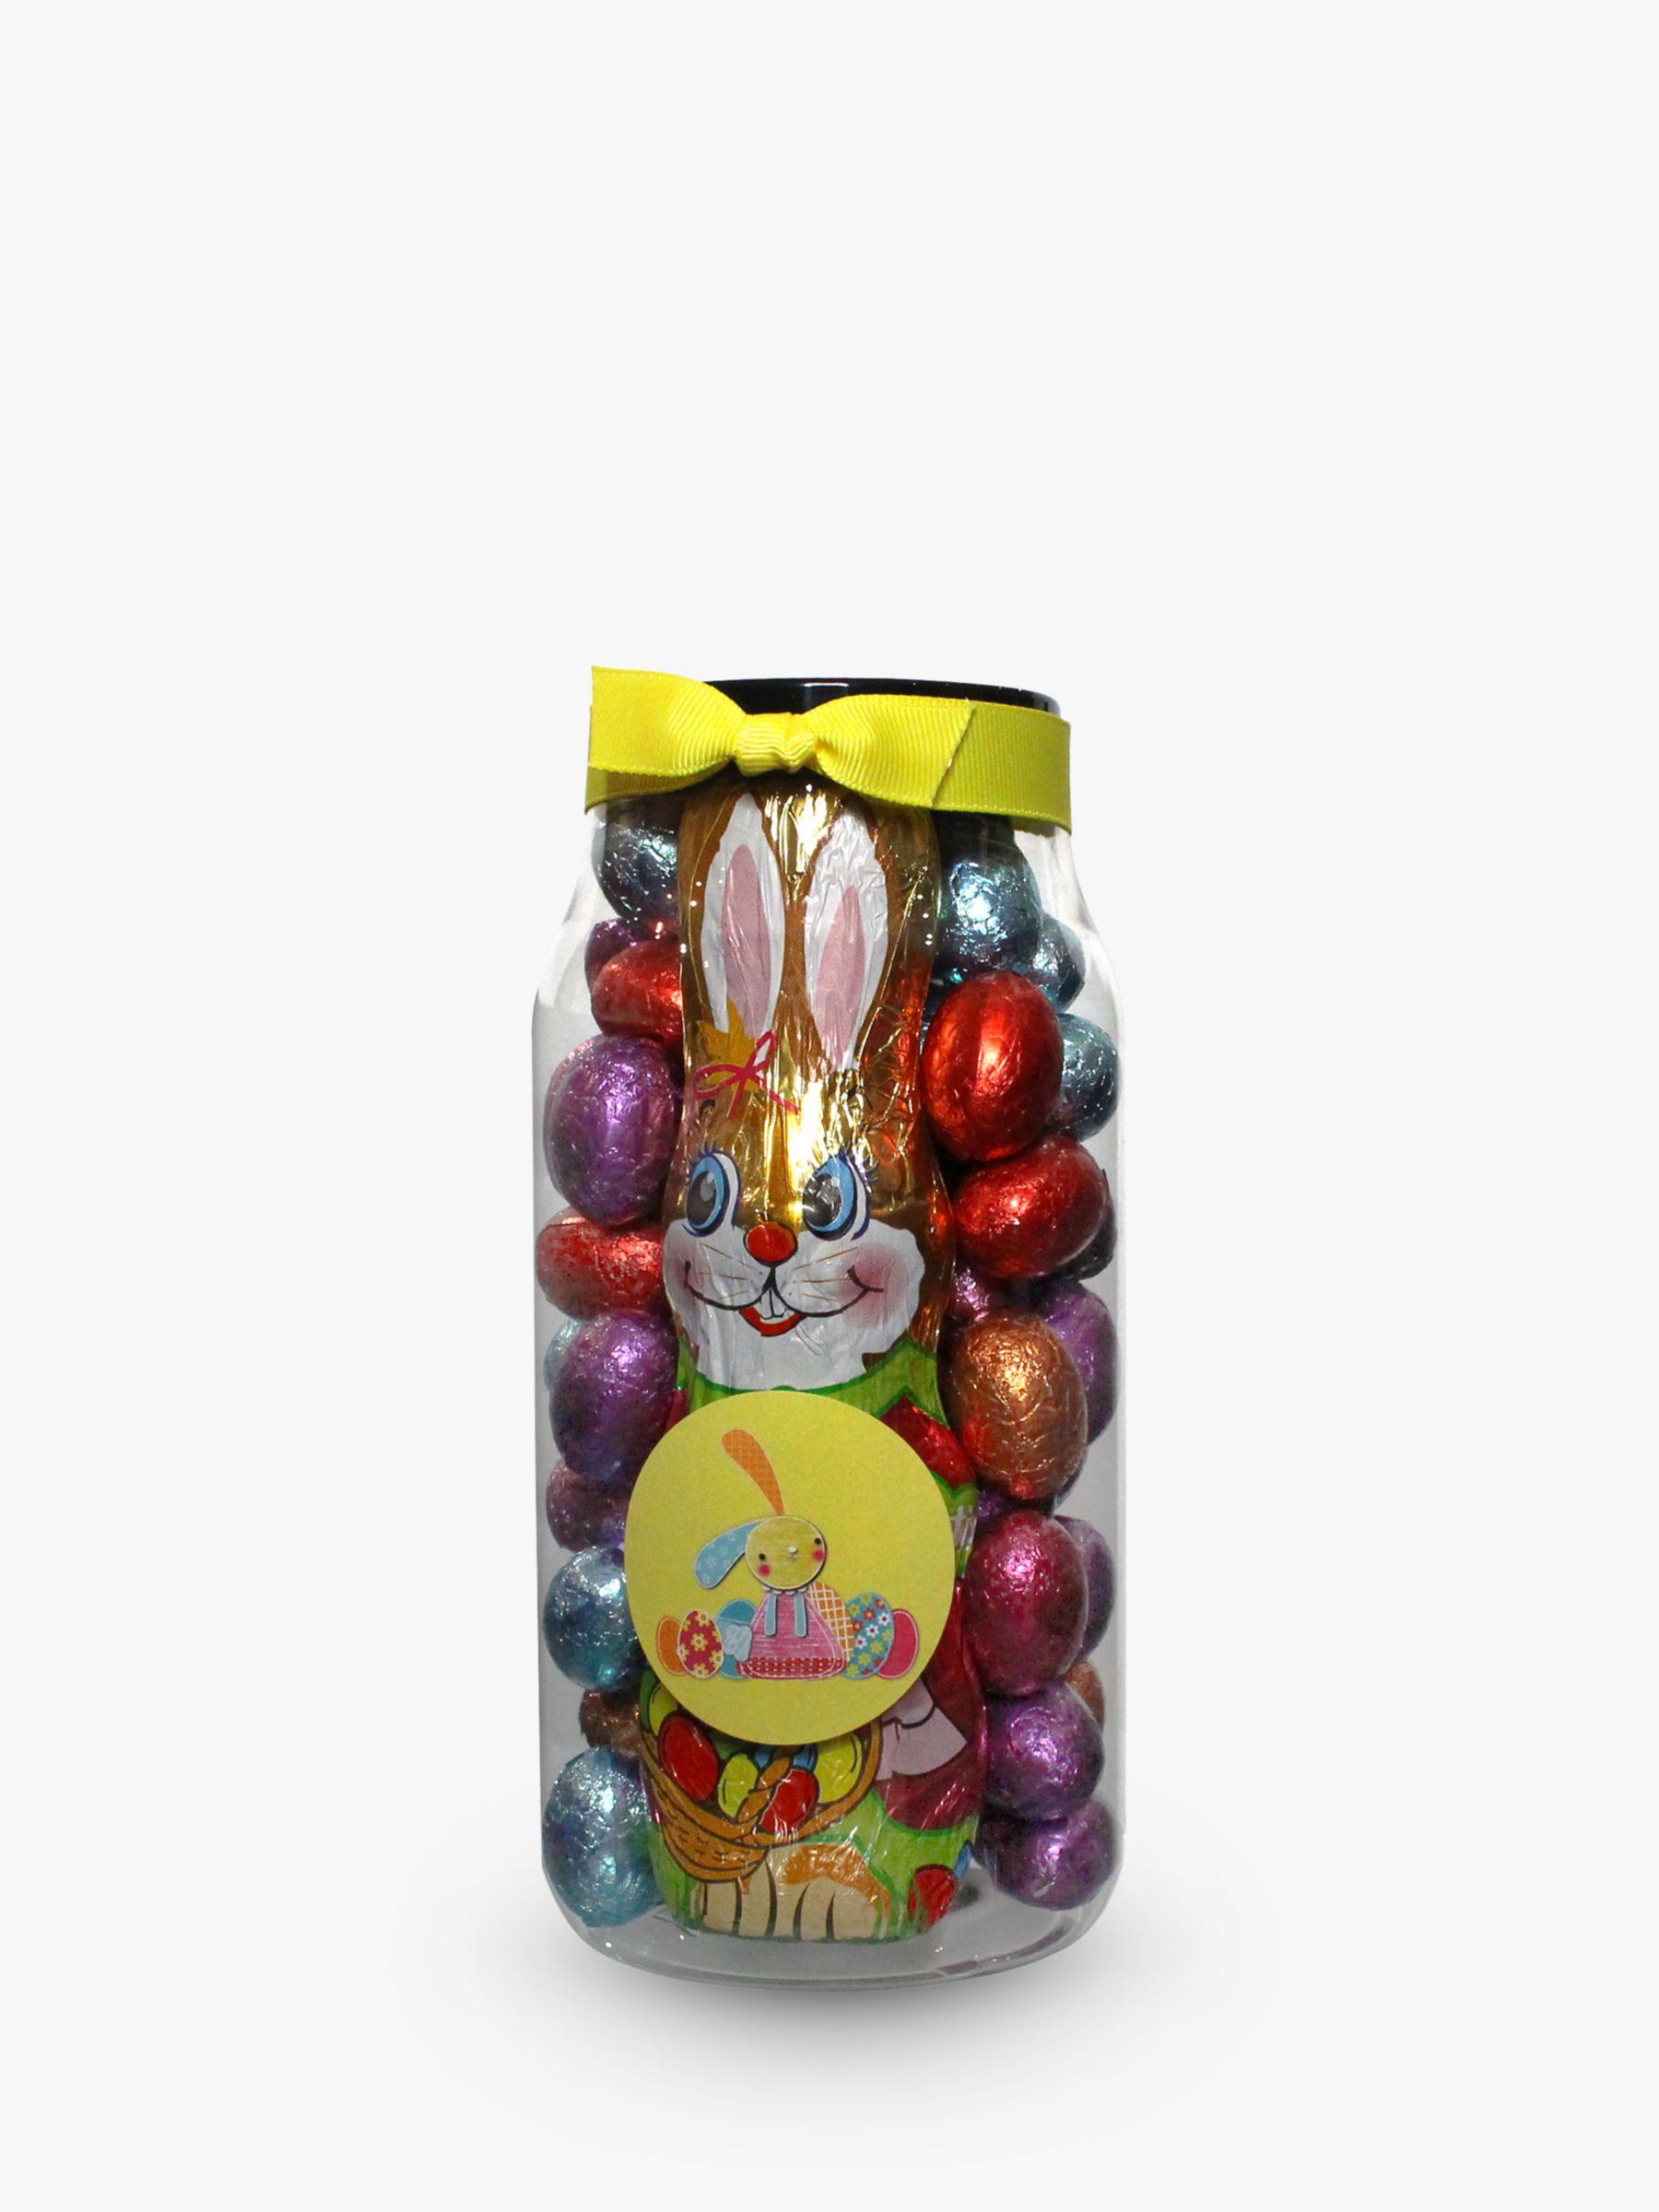 Farhi Farhi Milk Chocolate Bunny and Praline Eggs, 570g